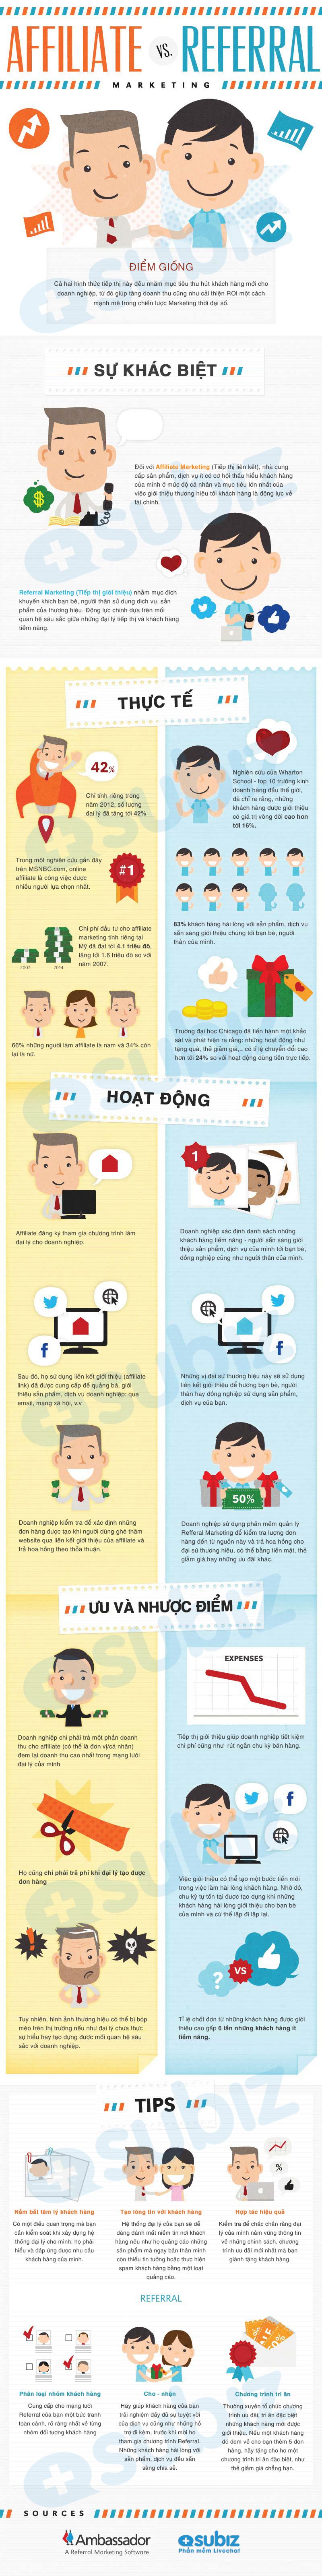 Affiliate-Vs-Referral-Marketing-Infographic-infographicsmania